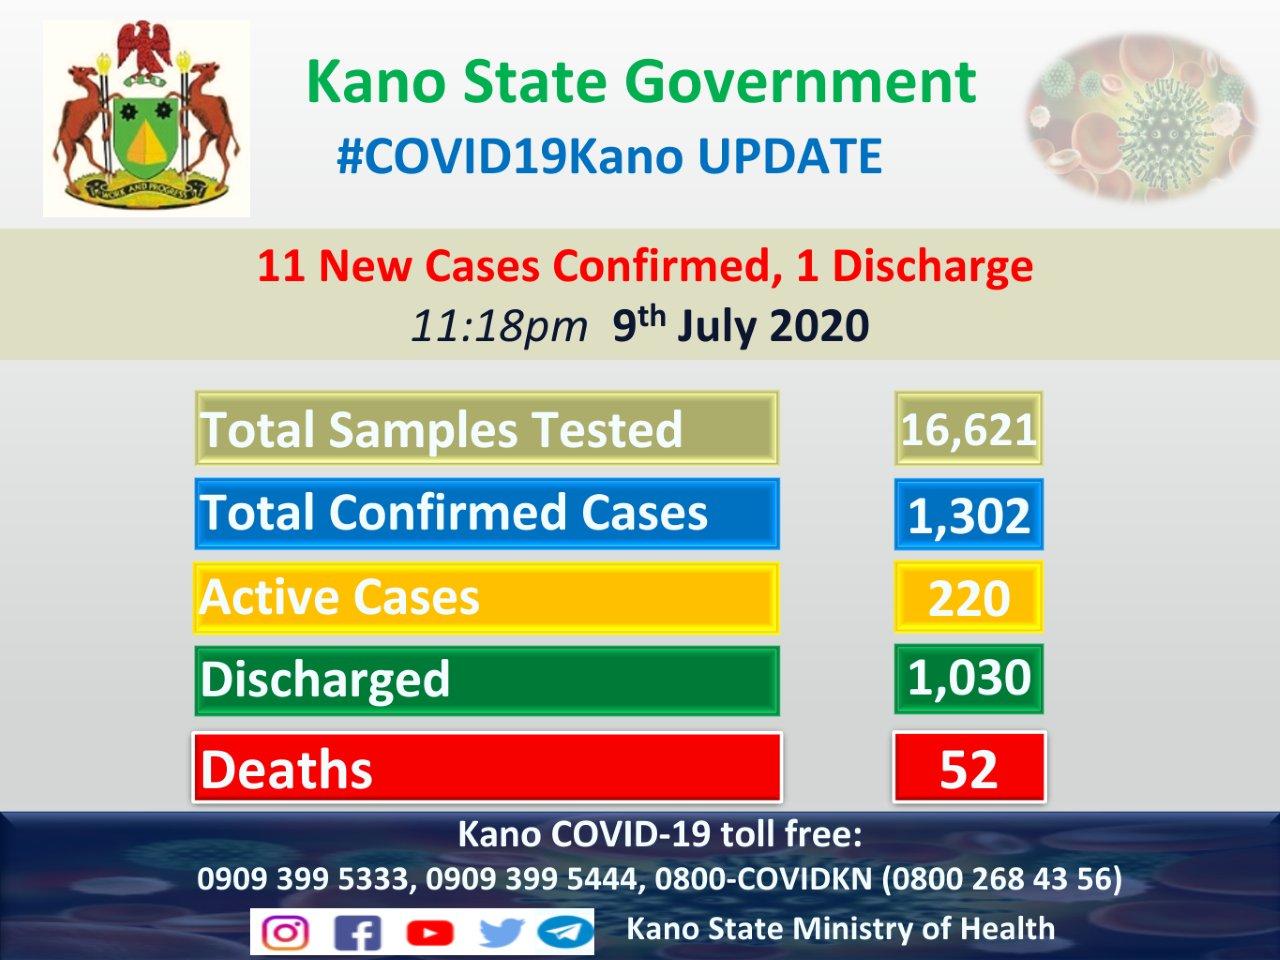 Kano Covid19 Update